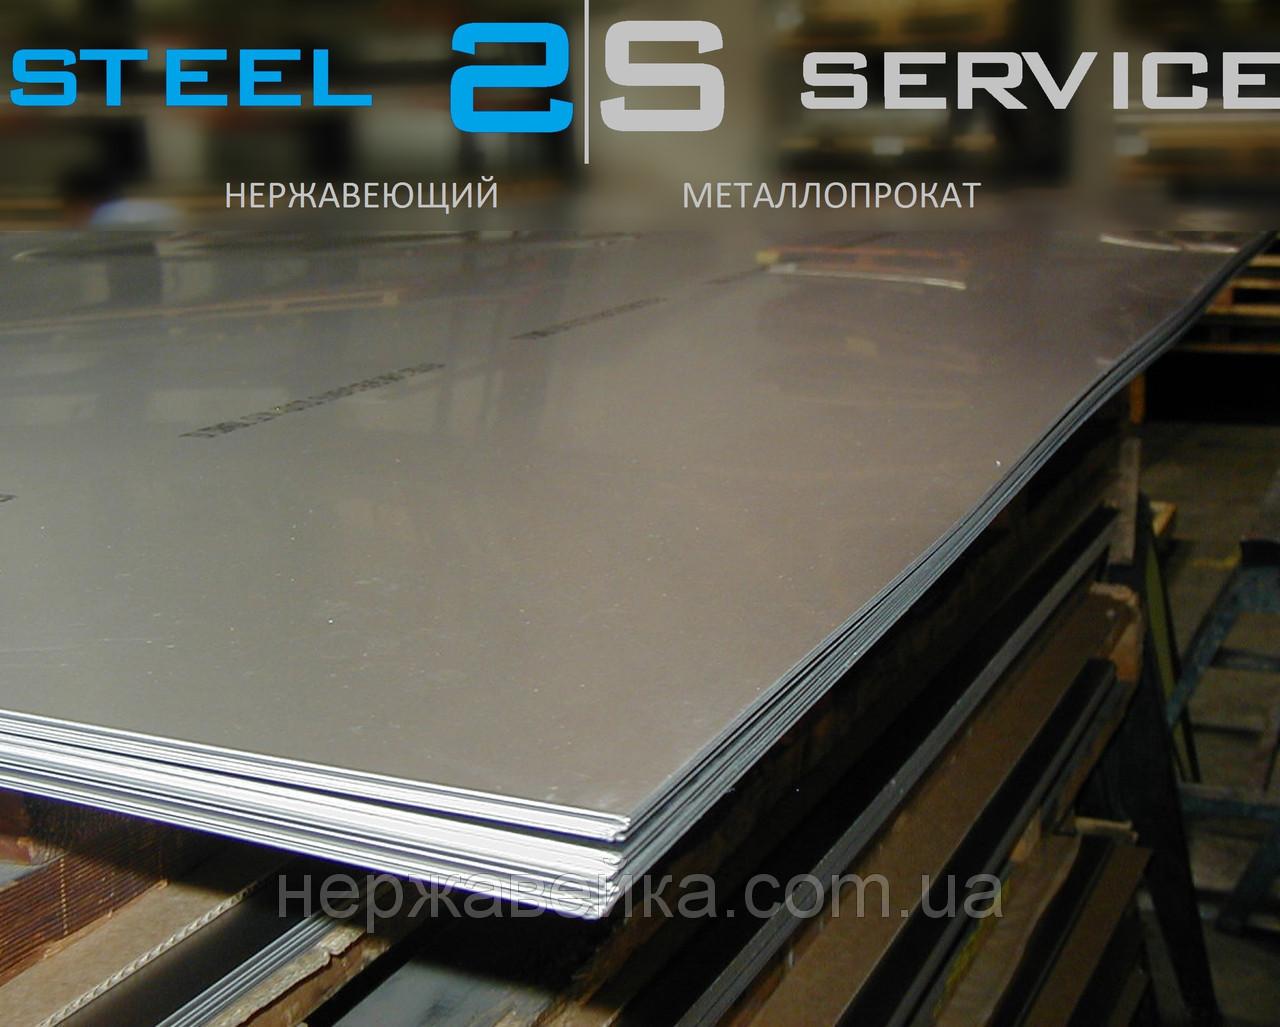 Нержавейка лист 1х1500х3000мм AISI 430(12Х17) BA - зеркало, технический